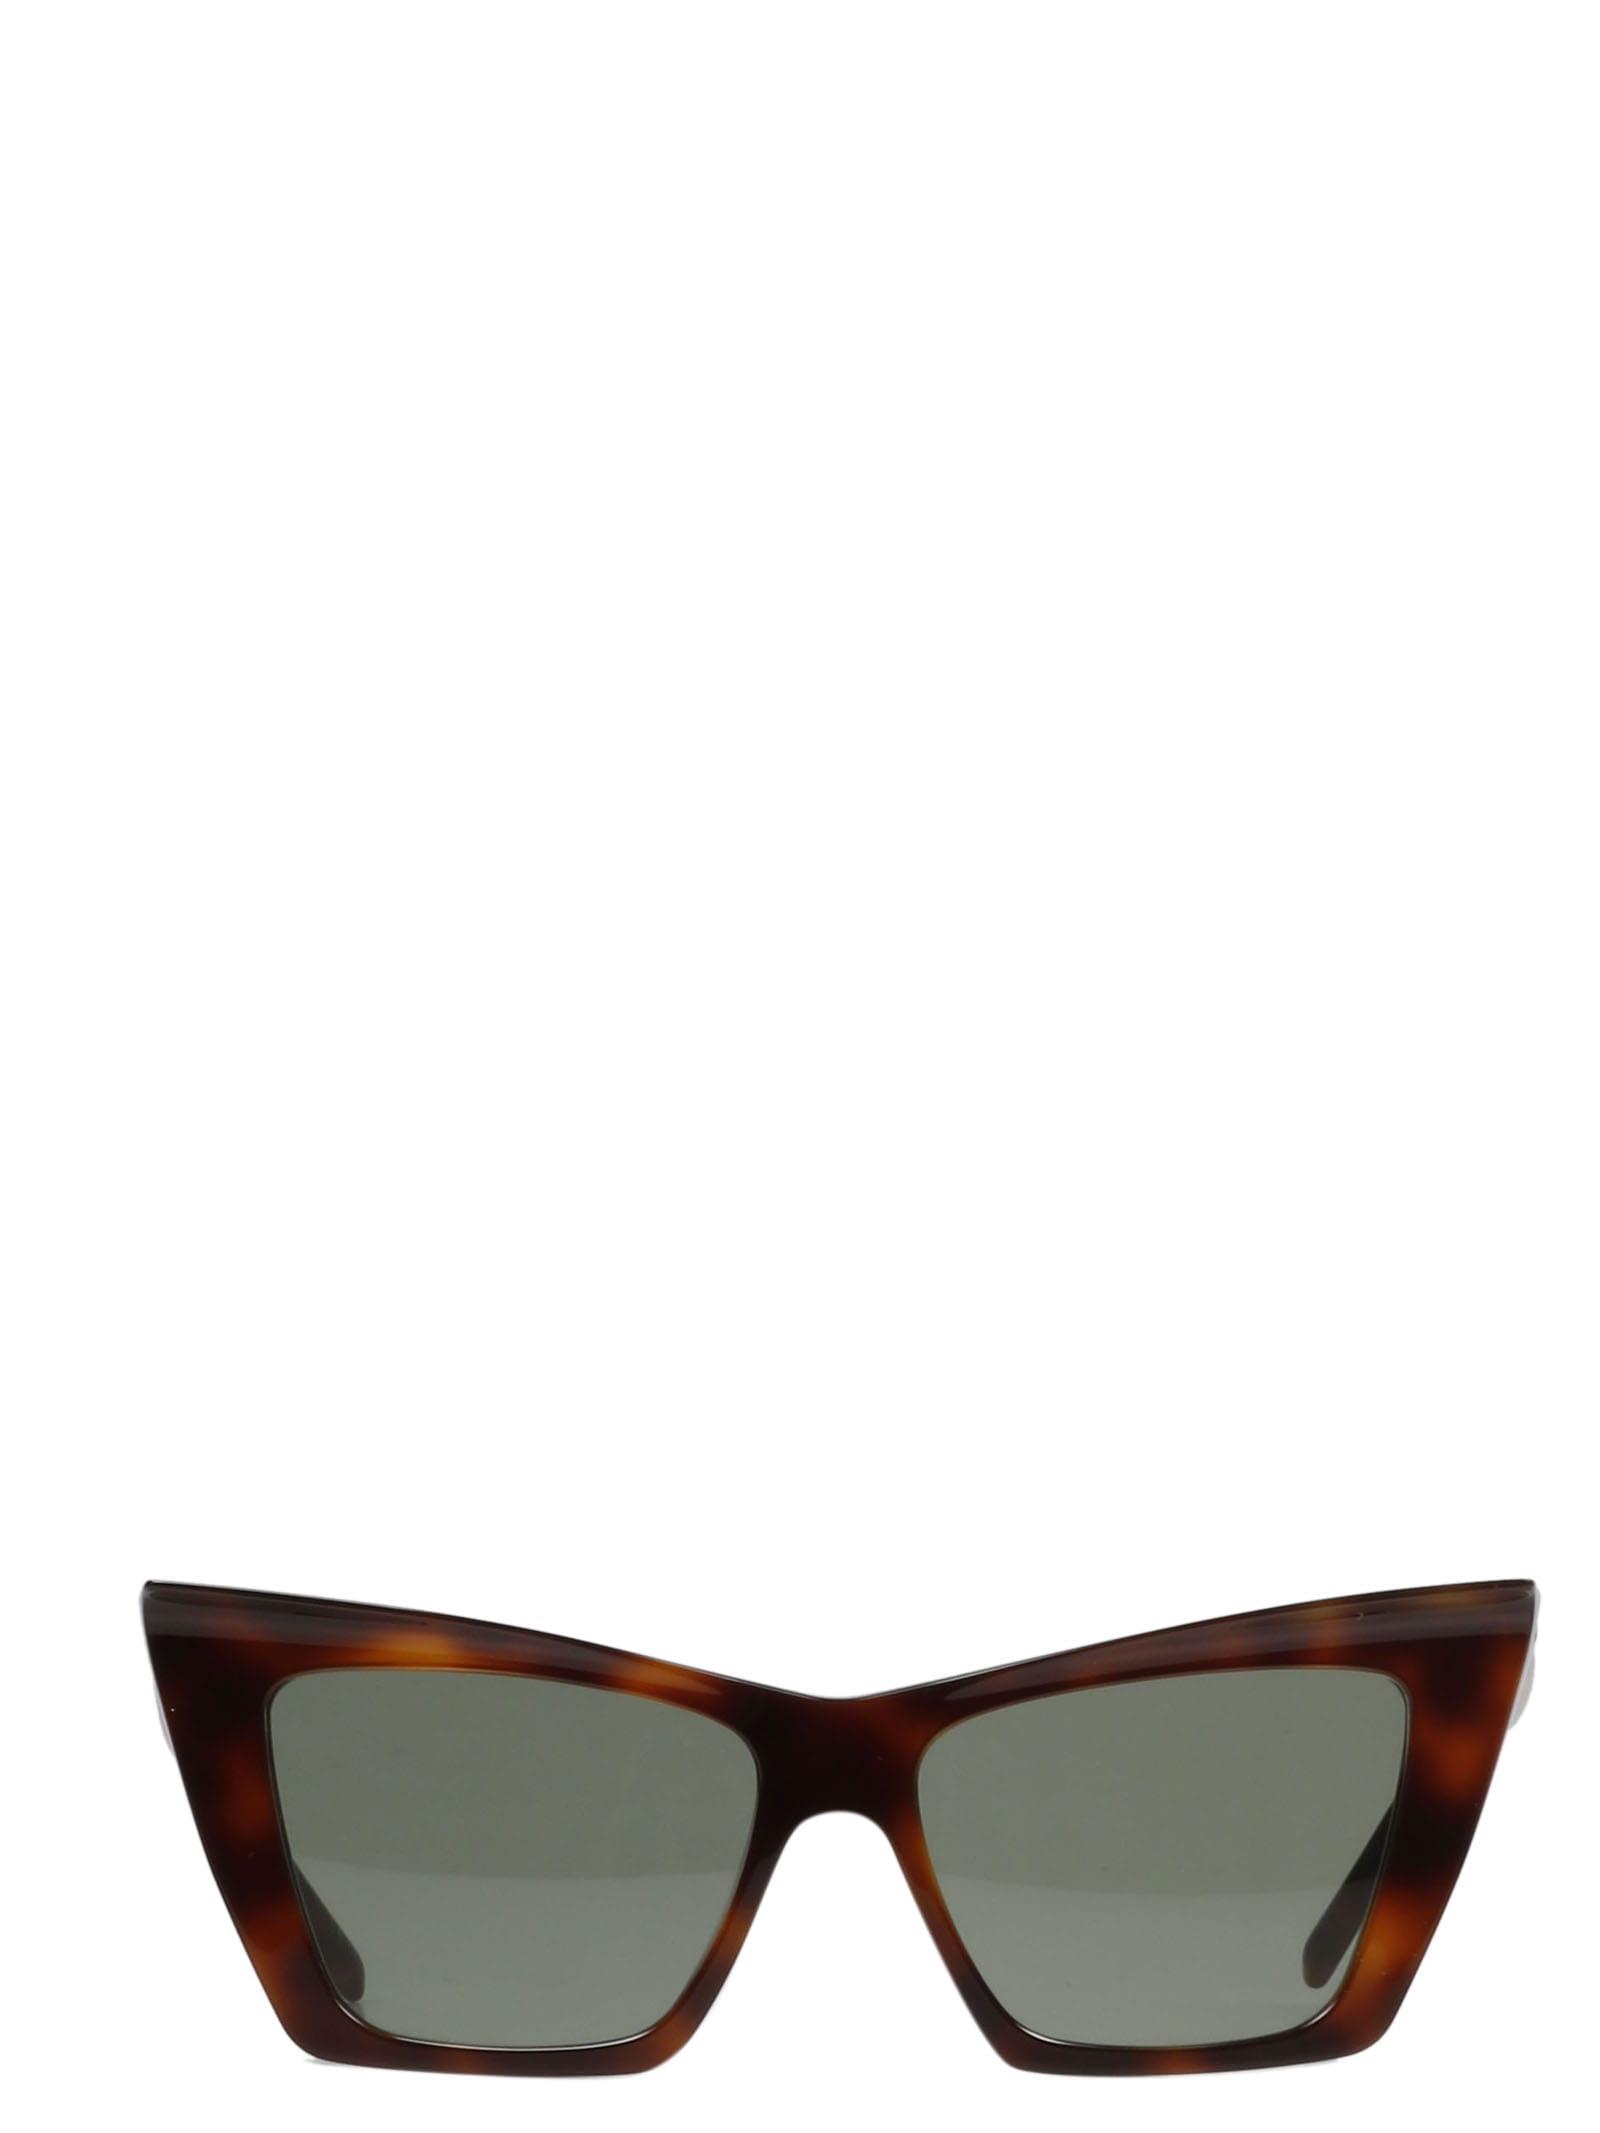 Saint Laurent Sl 372 Sunglasses